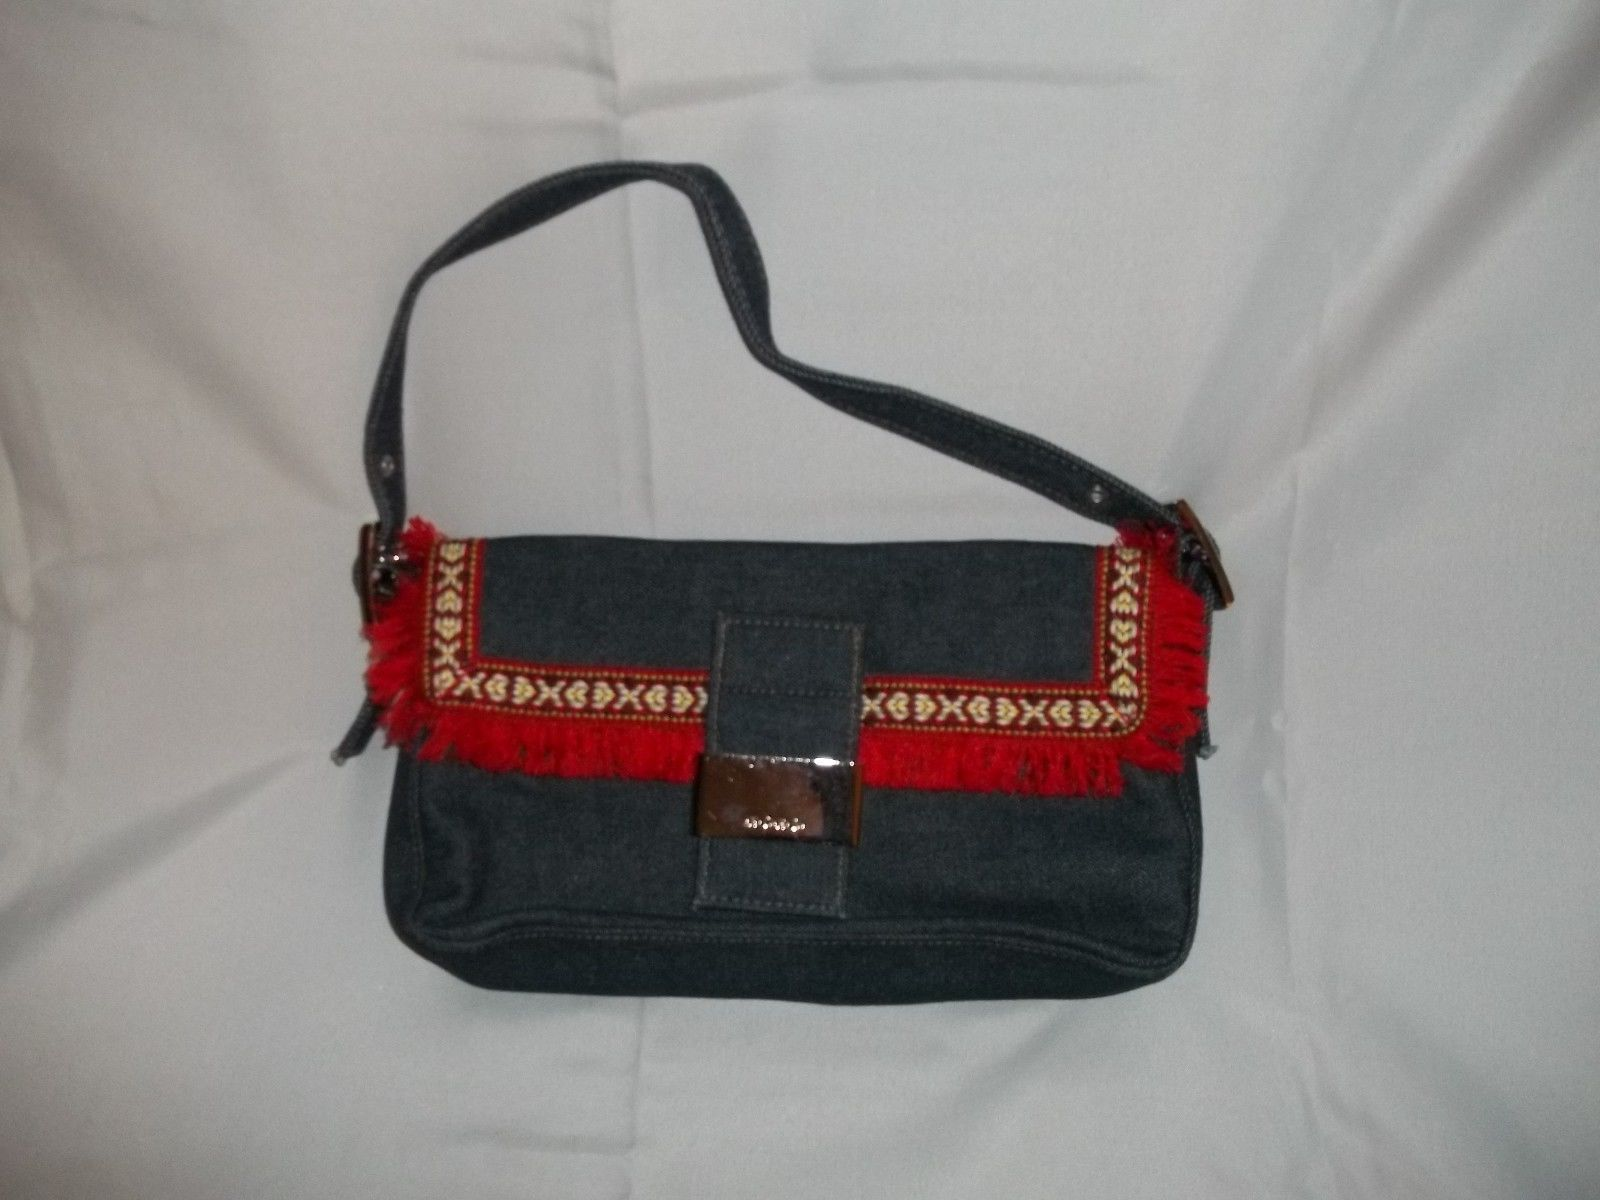 XOXO Denim With a Fringe Handbag Purse Retro Flair Adjustable Strap